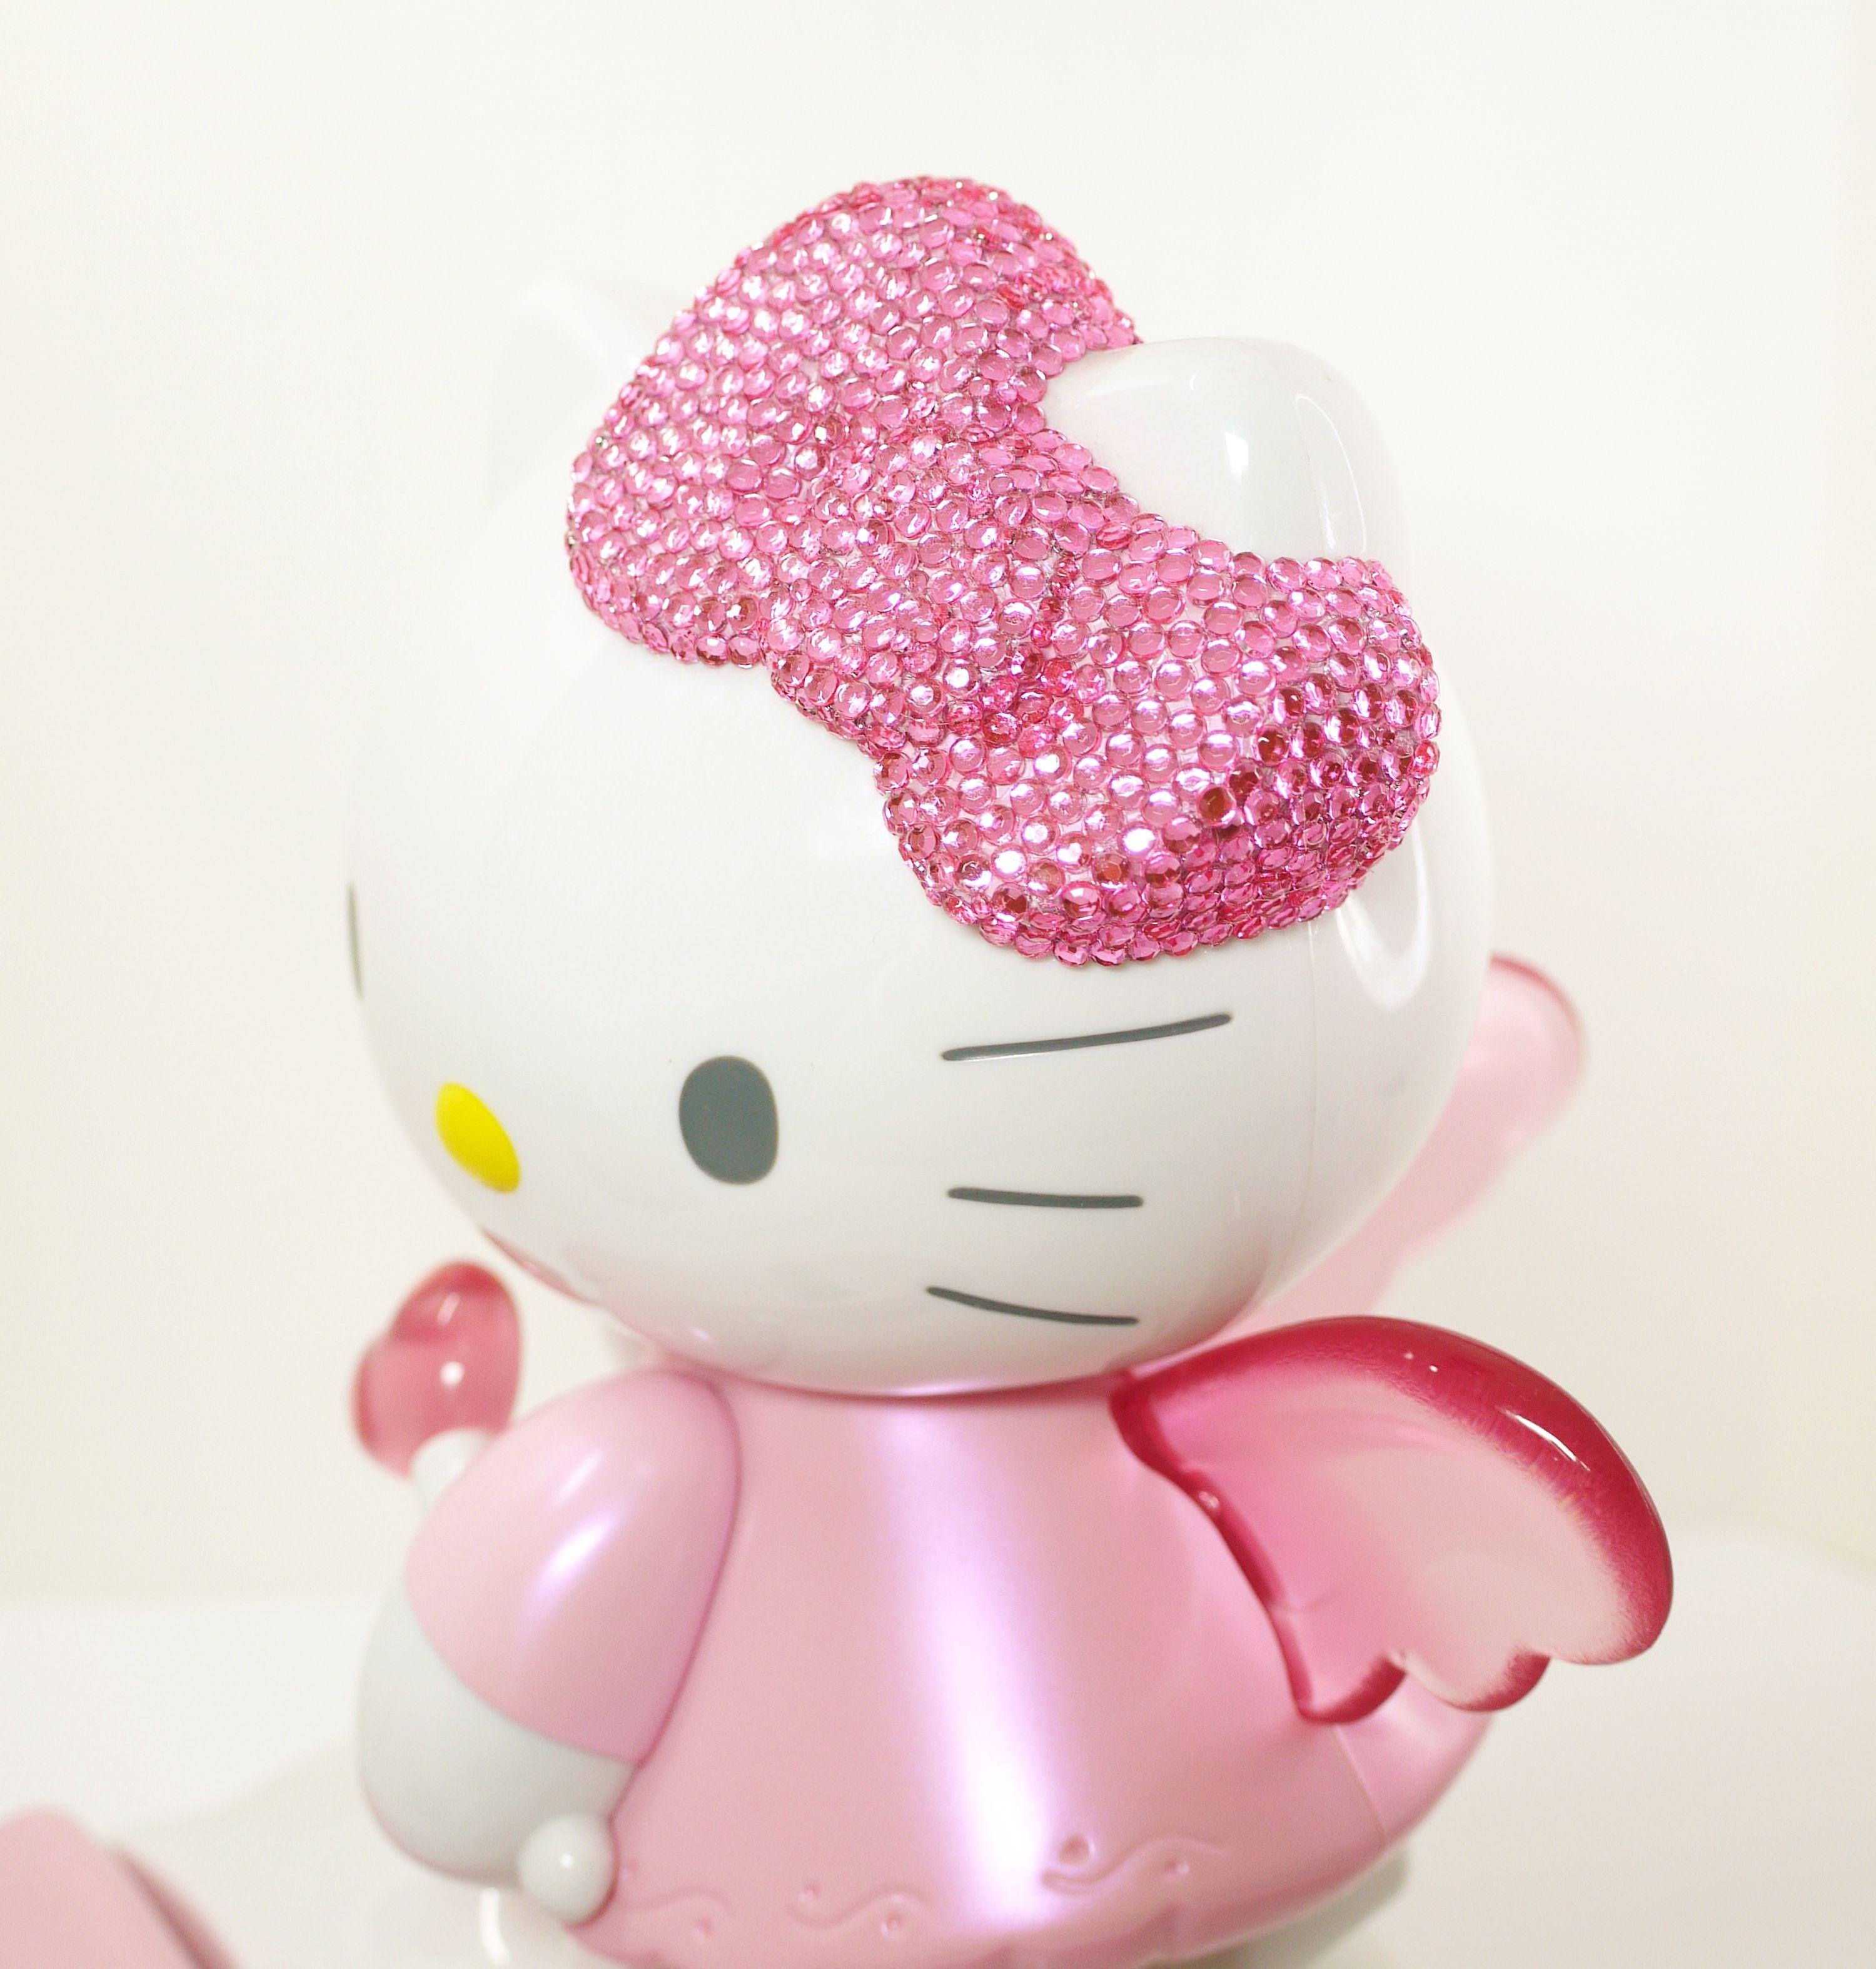 833483bff Sanrio Hello Kitty Landline Home Phone With Caller ID Angel Wings Lights Up